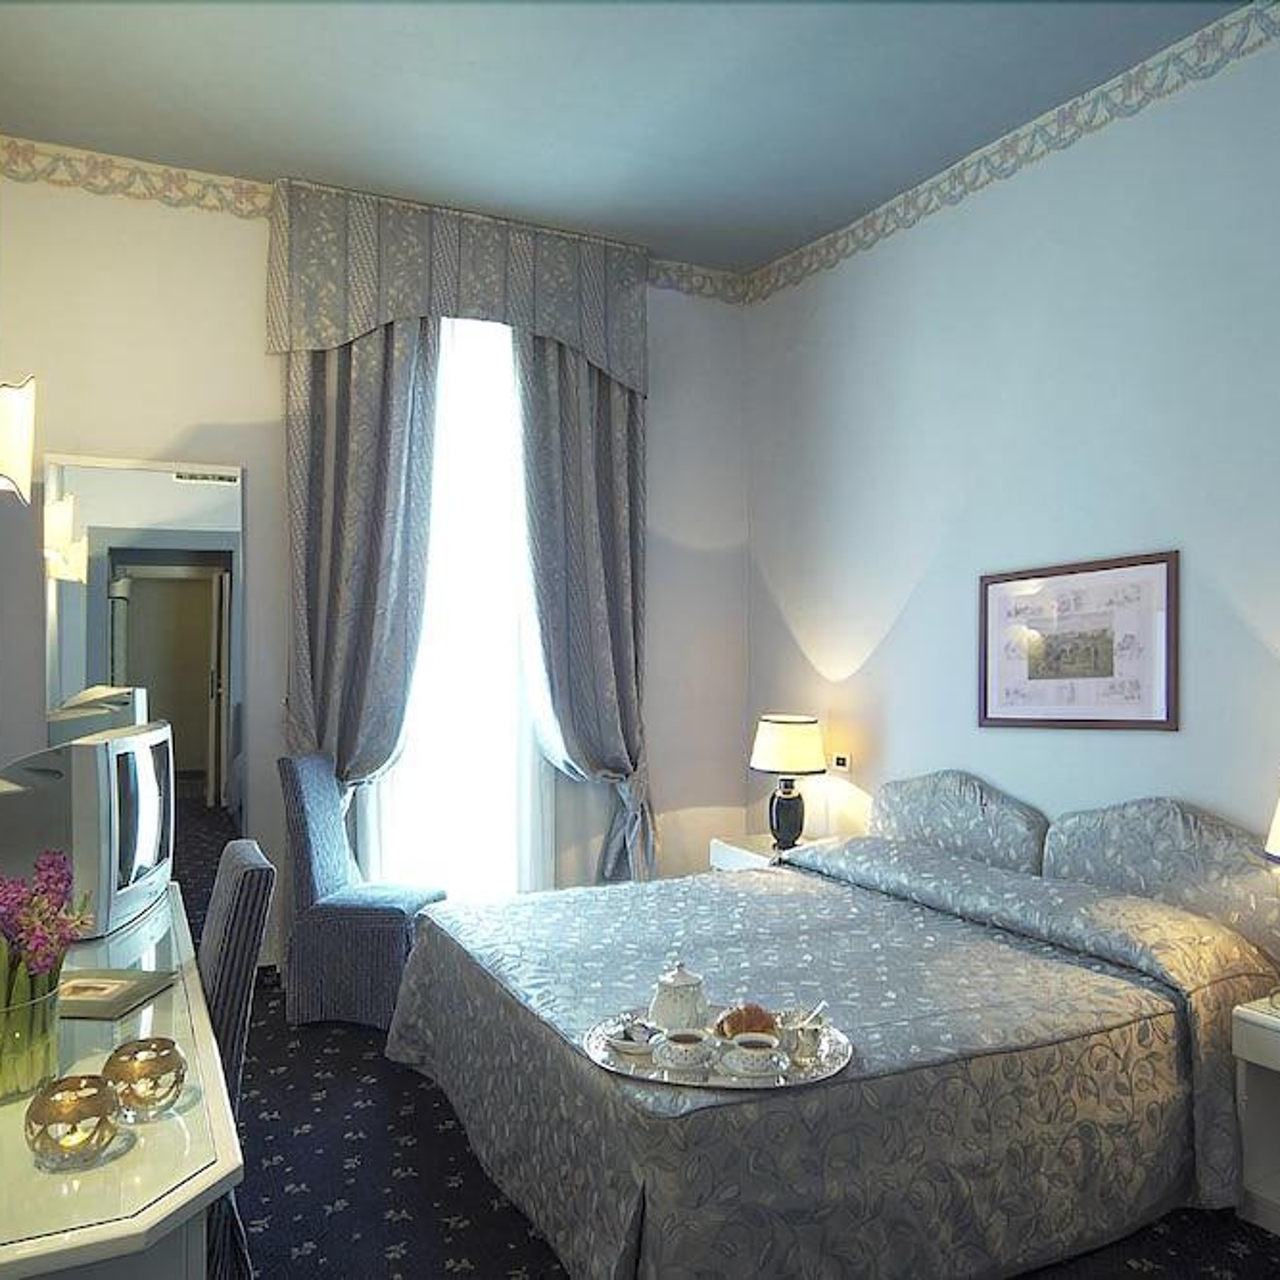 Hotel Adua Regina Di Saba 4 Hrs Star Hotel In Montecatini Terme Tuscany